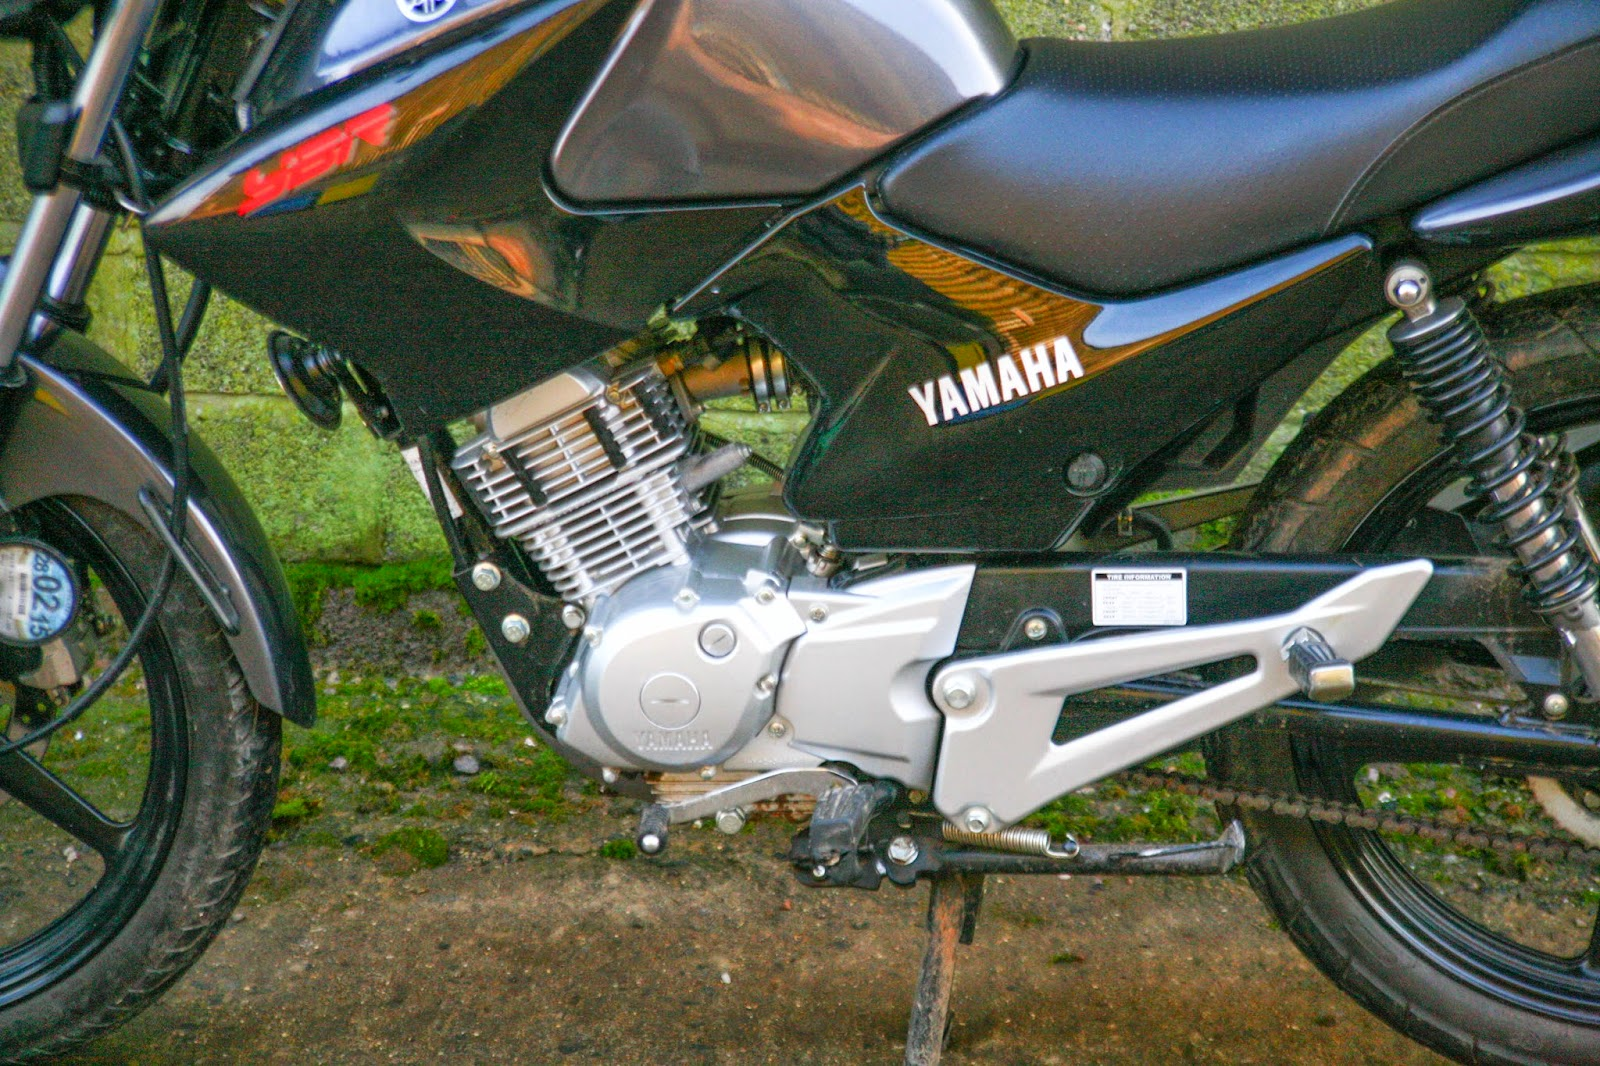 Yamaha Ybr 125 Owner Blog   Yamaha Ybr 125 For Sale Uk